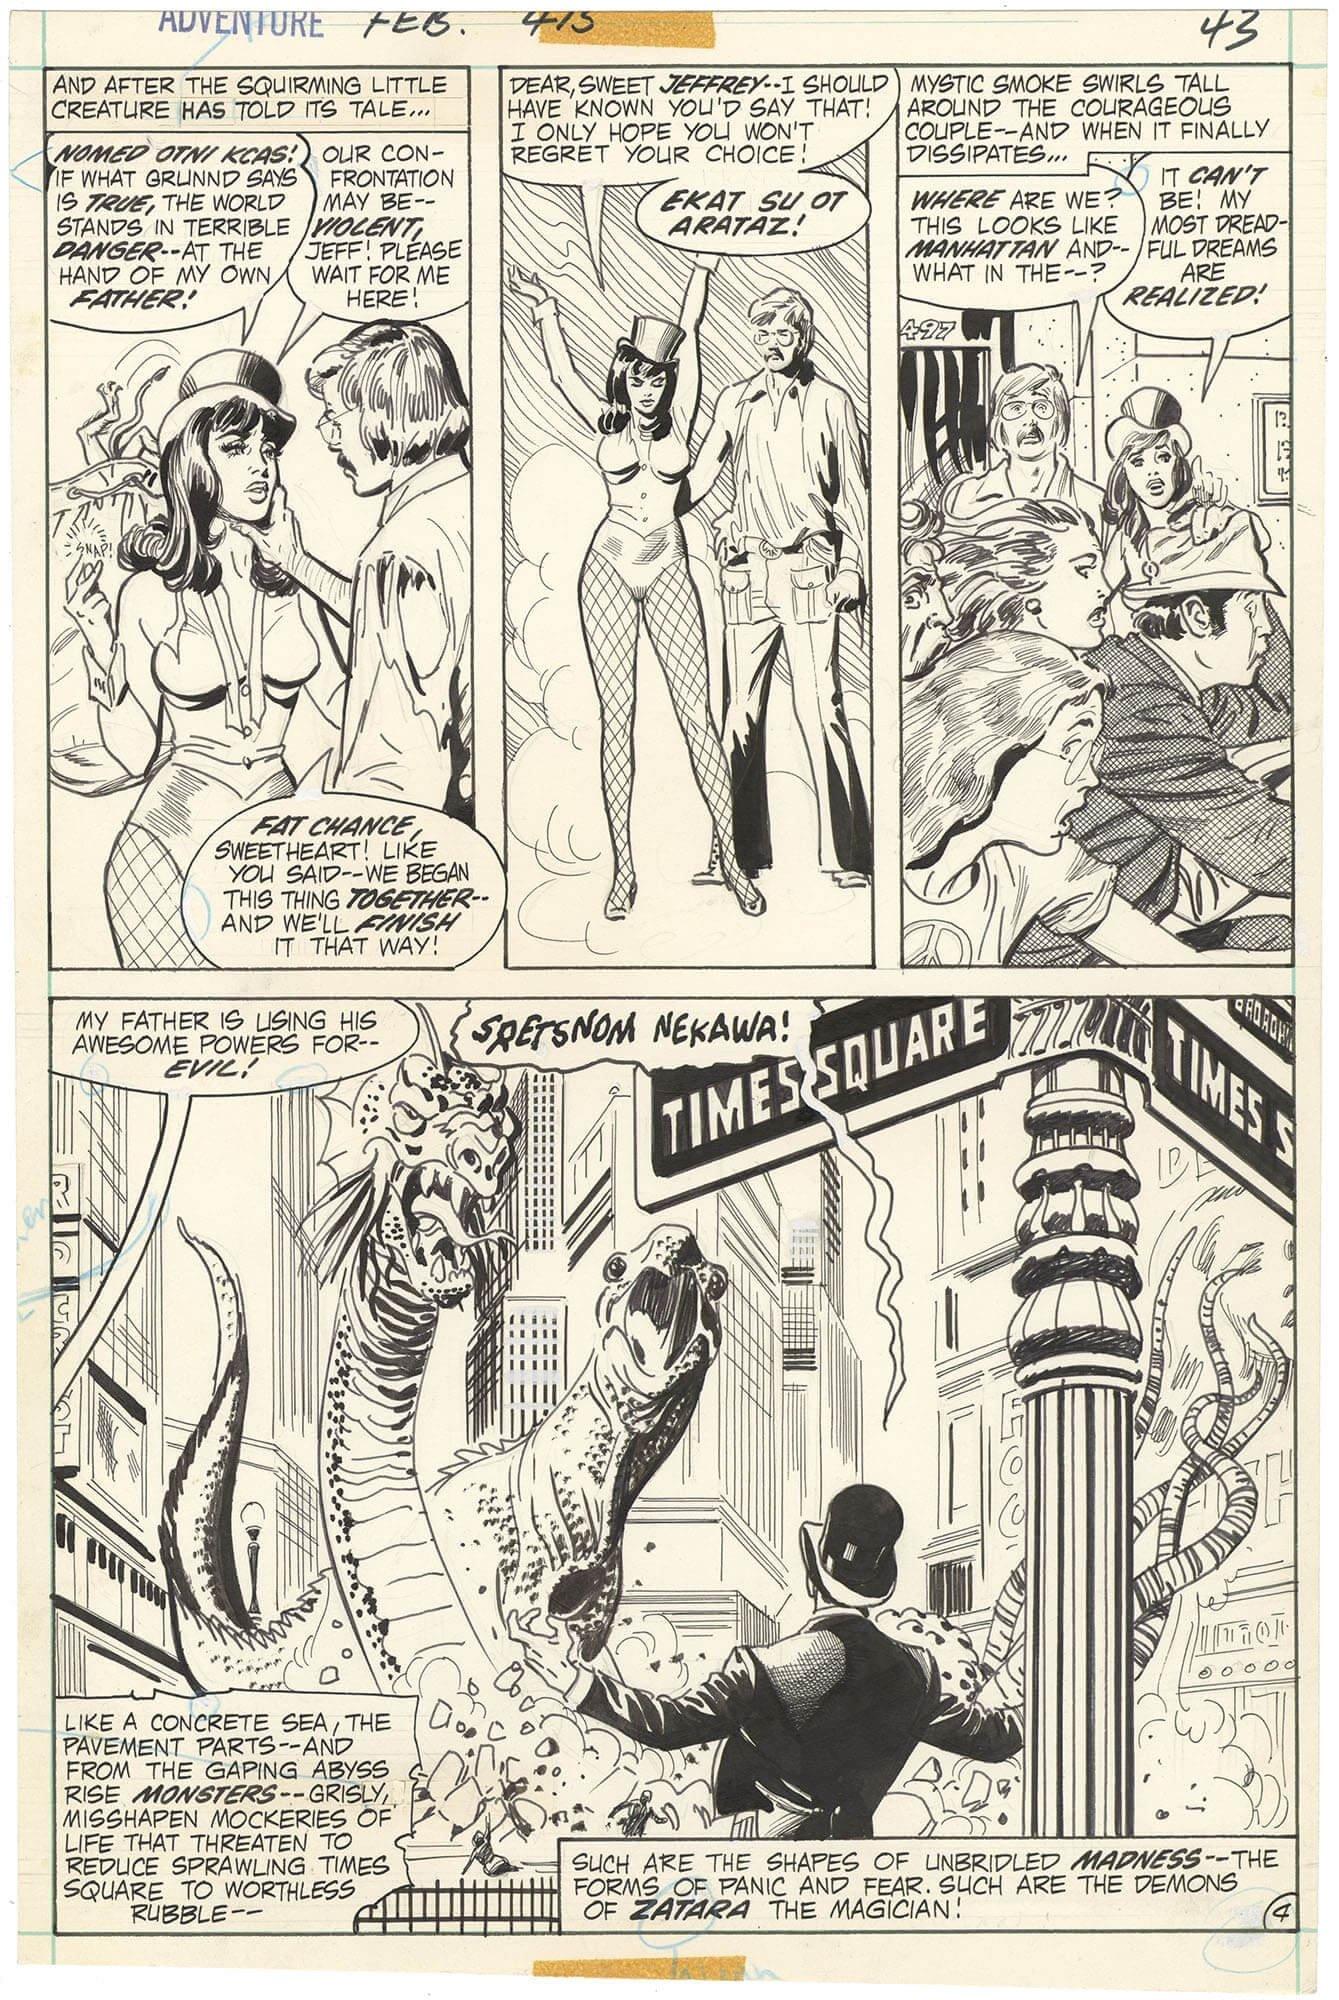 Adventure Comics #415 p4